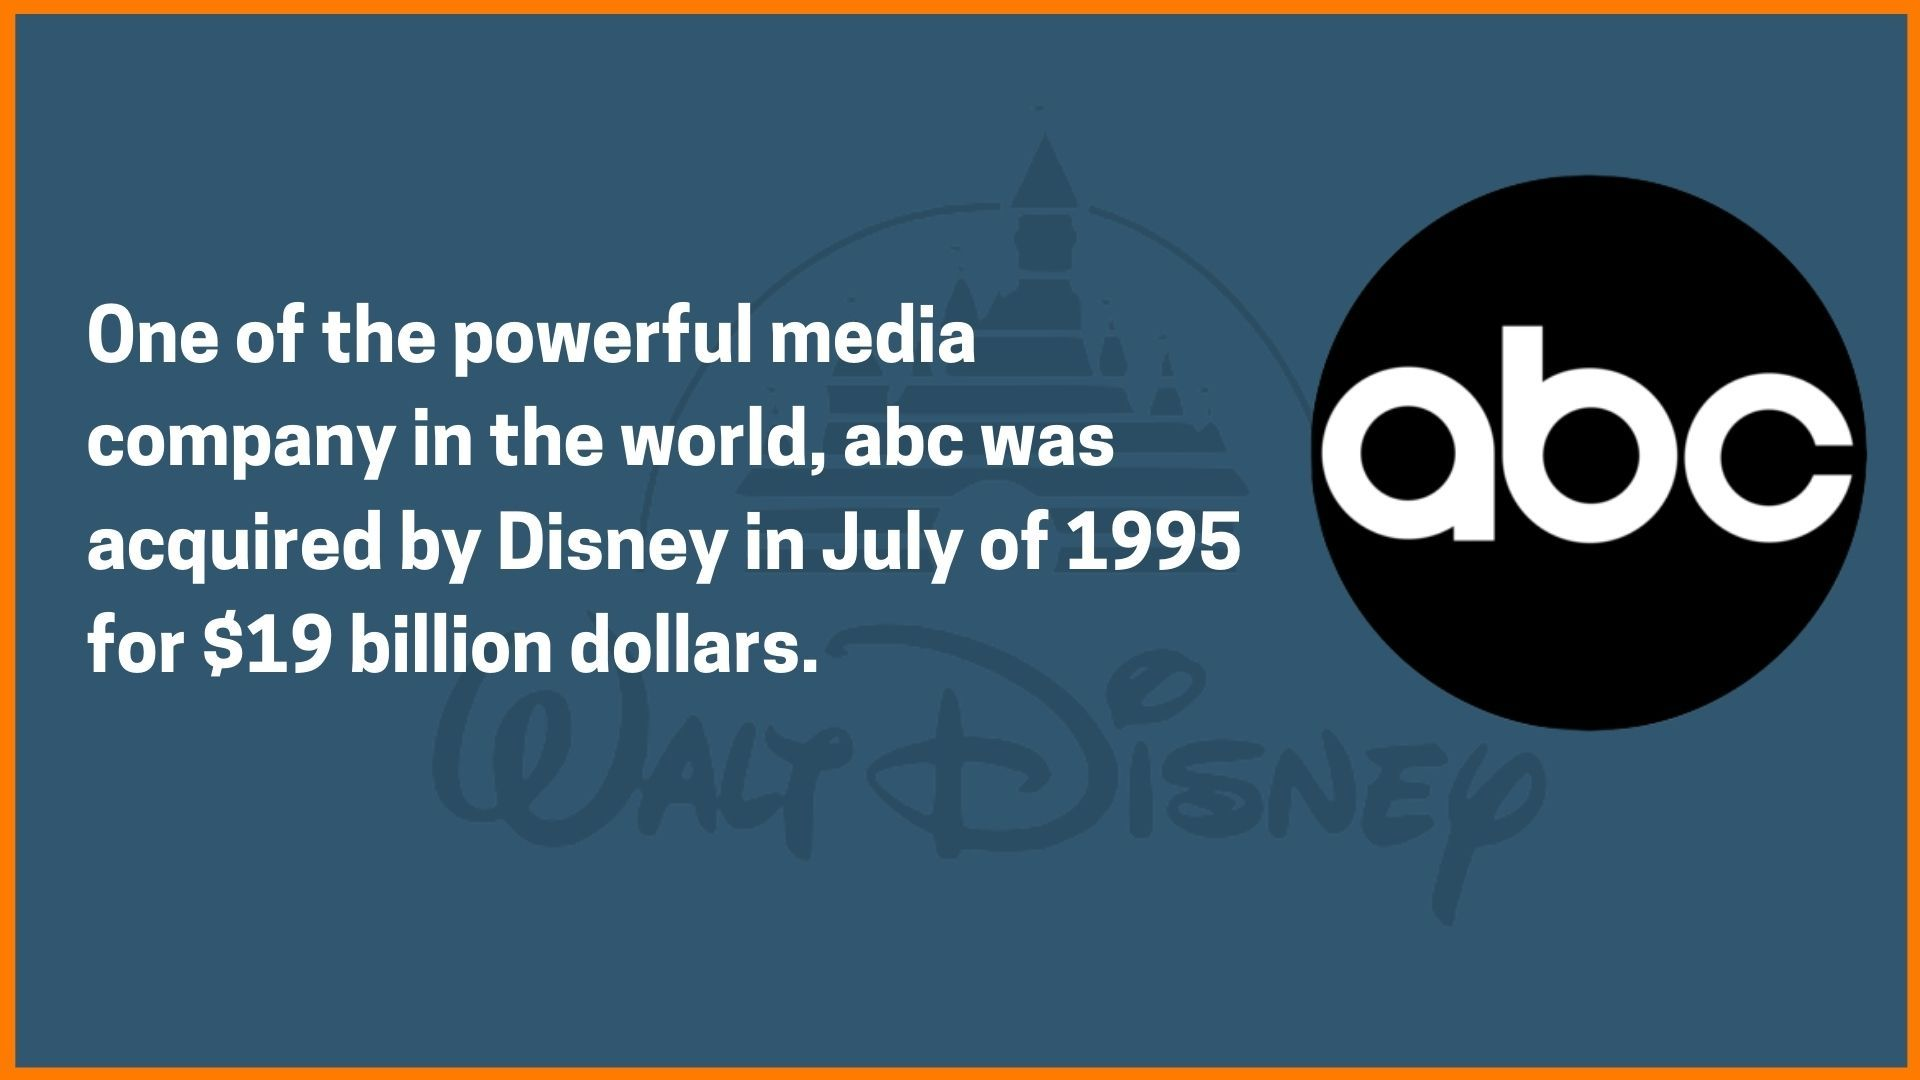 Disney acquired abc for  $19 billion dollars